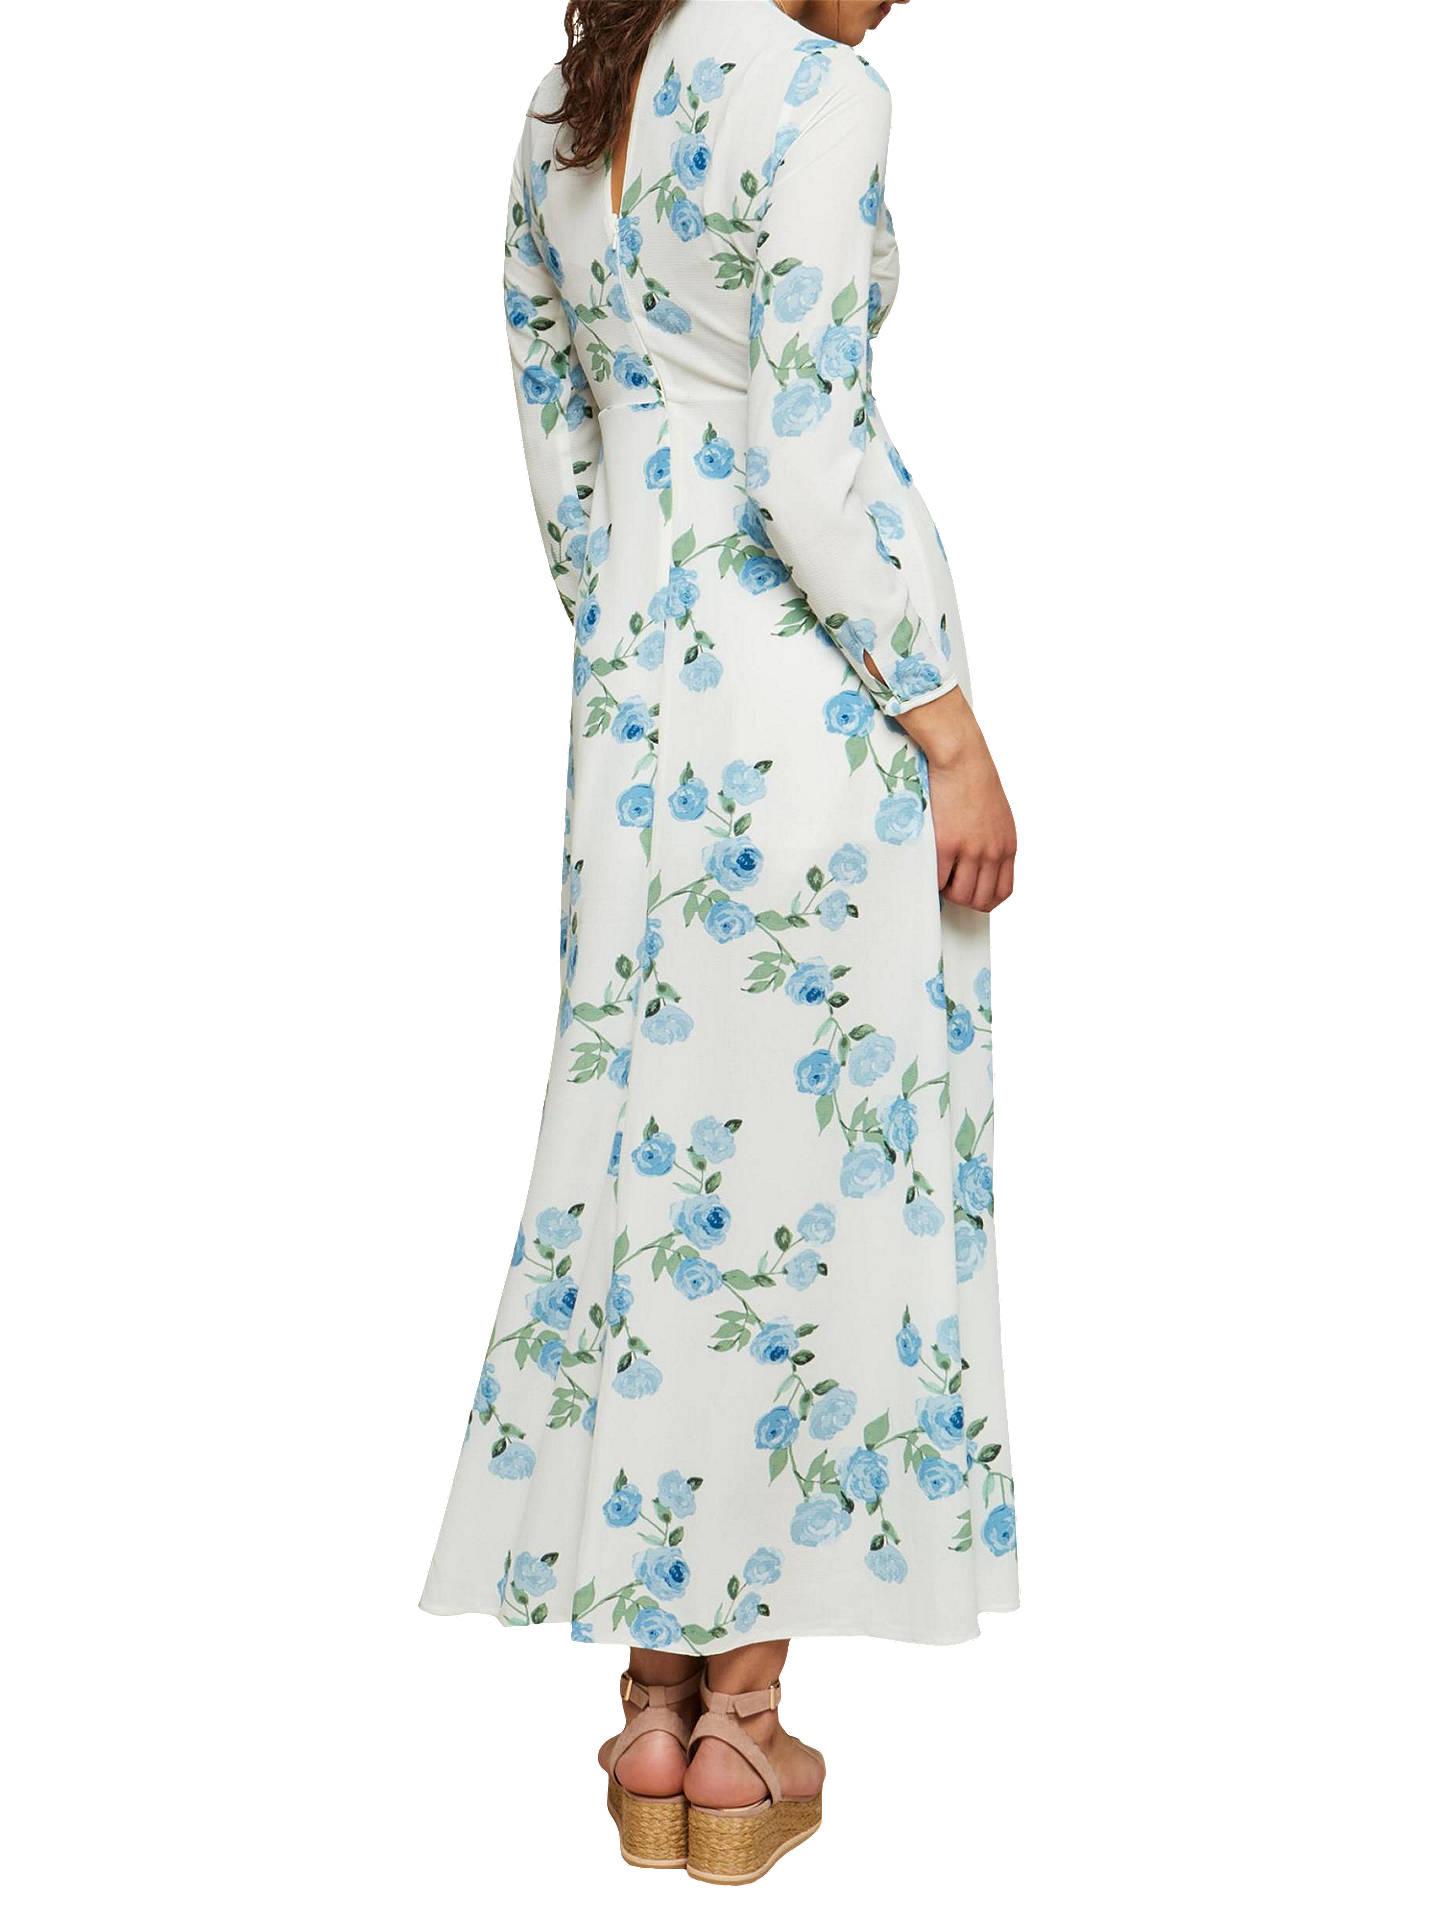 0e2000c484c5 Long Sleeve Maxi Dresses Petite - raveitsafe